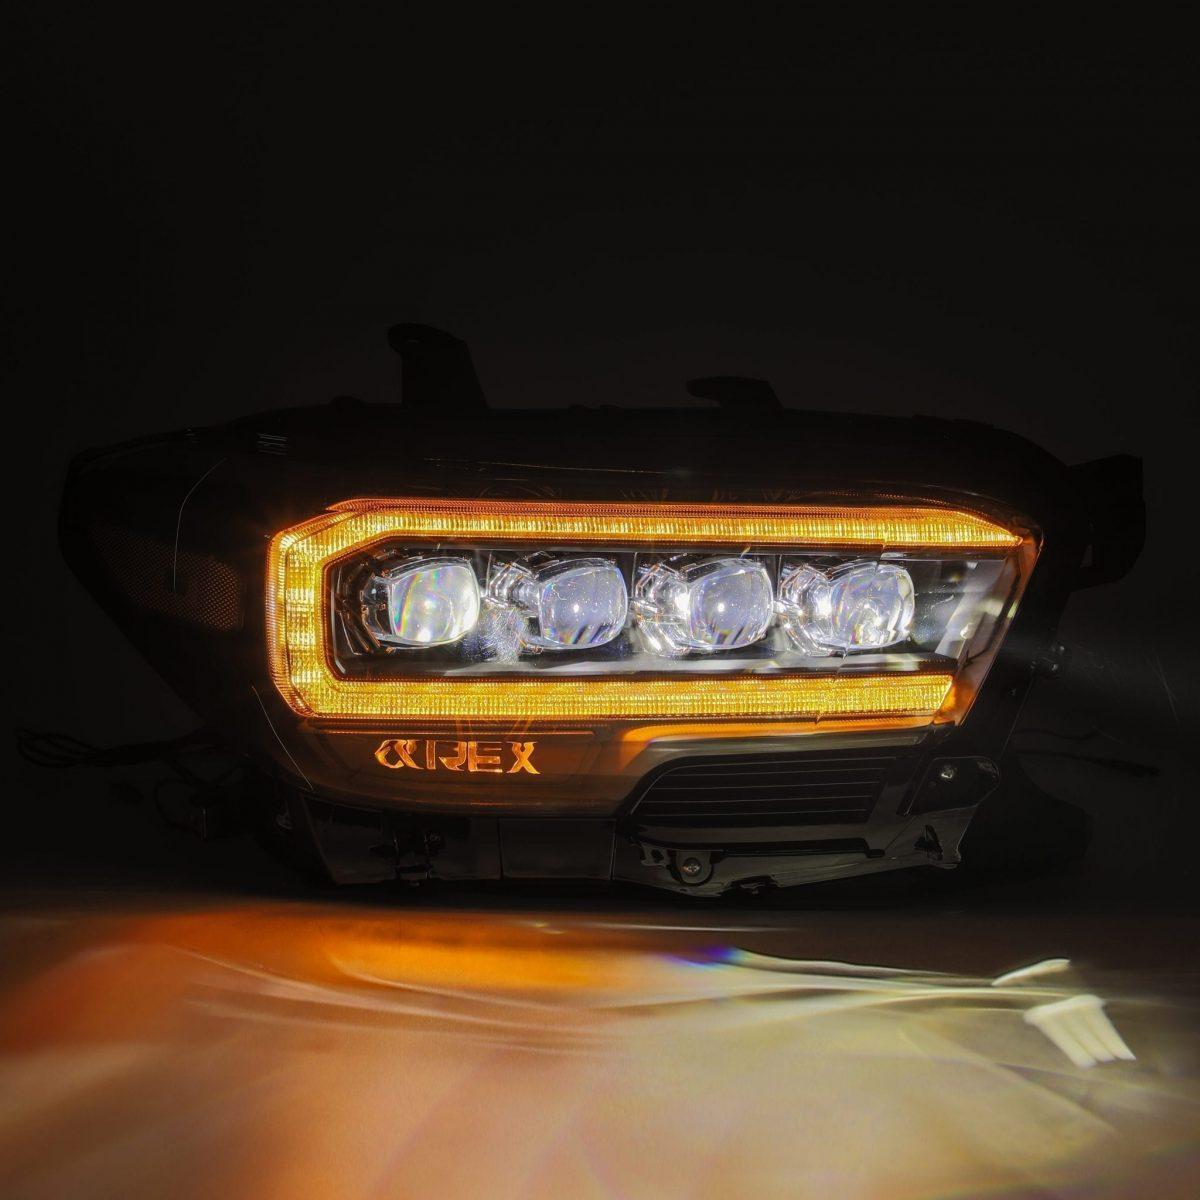 2016 2017 2018 2019 2020 Toyota Tacoma NOVA-Series Full LED Projector Headlights